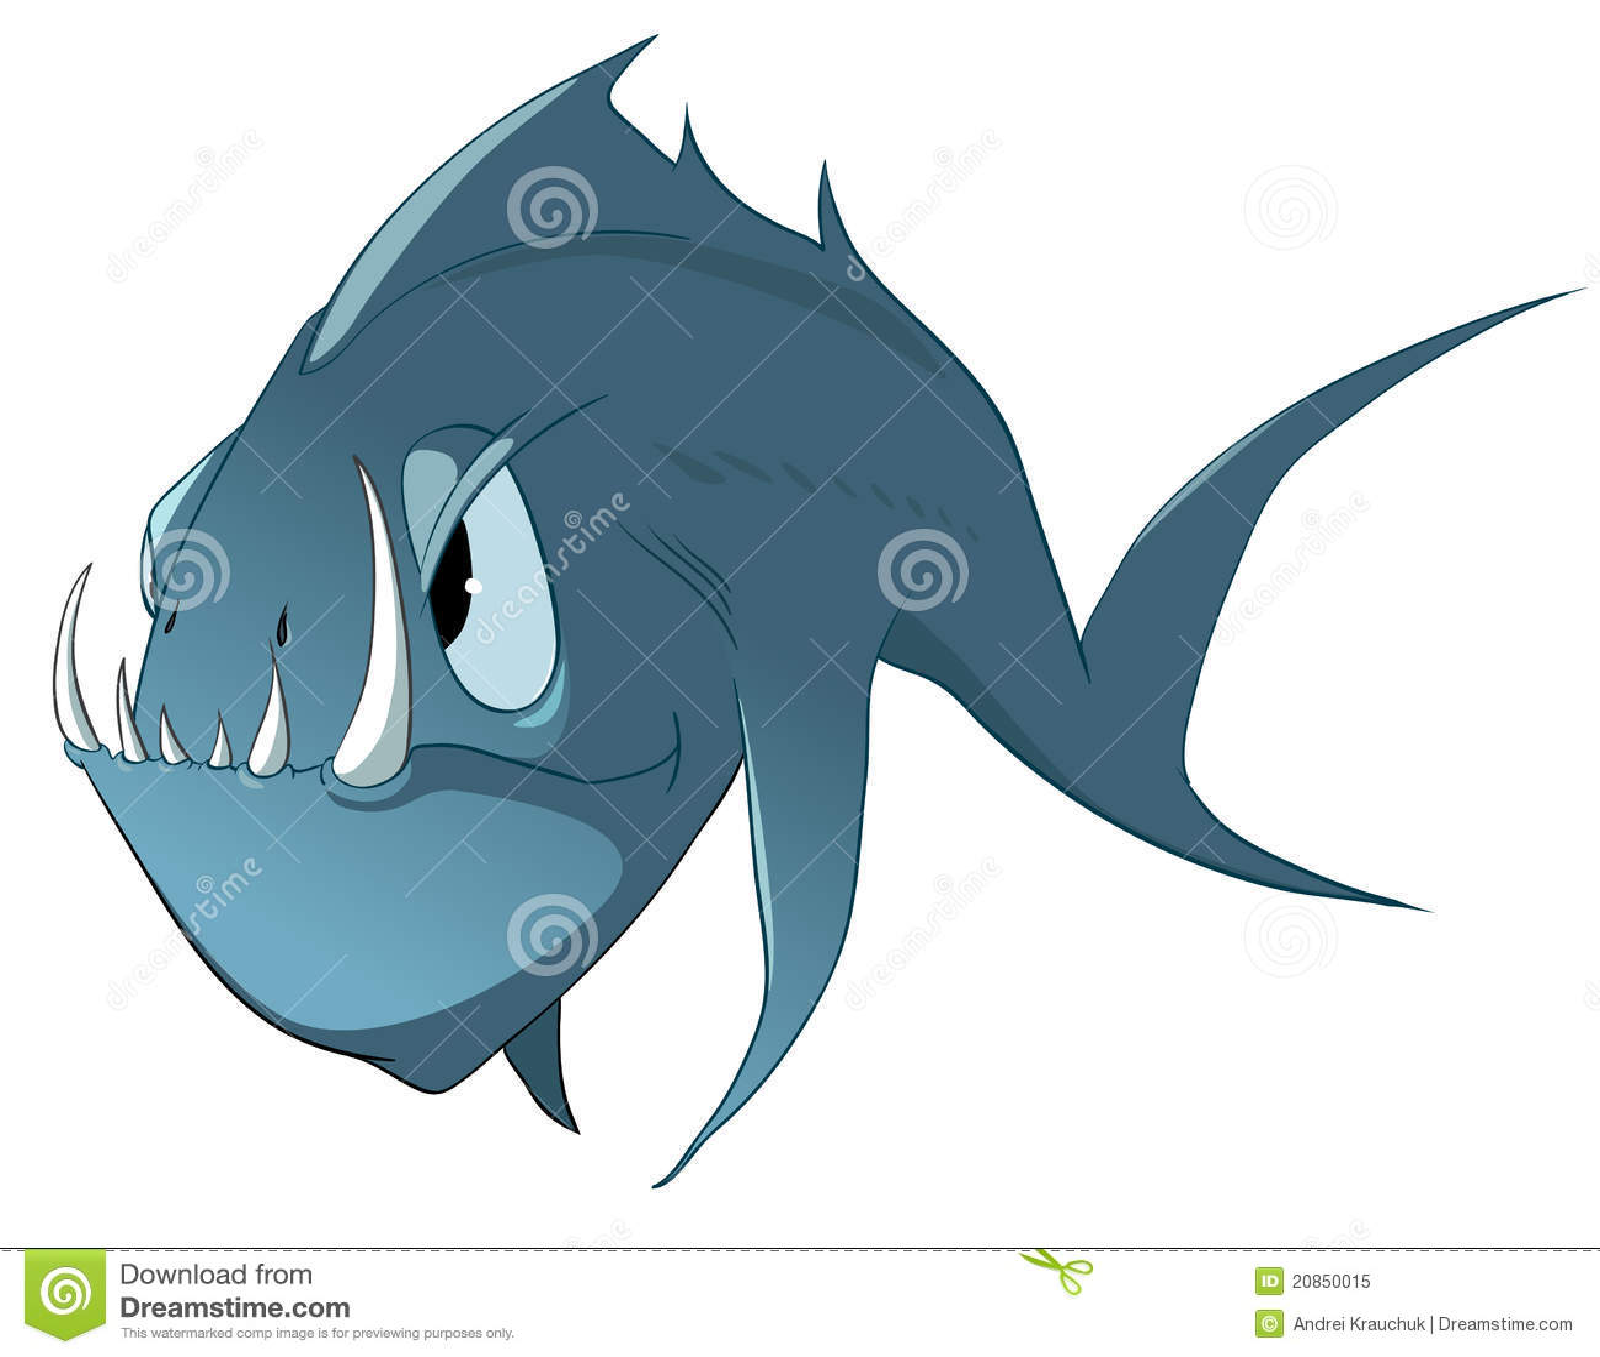 Cartoon Character Fish Stock Vector. Illustration Of